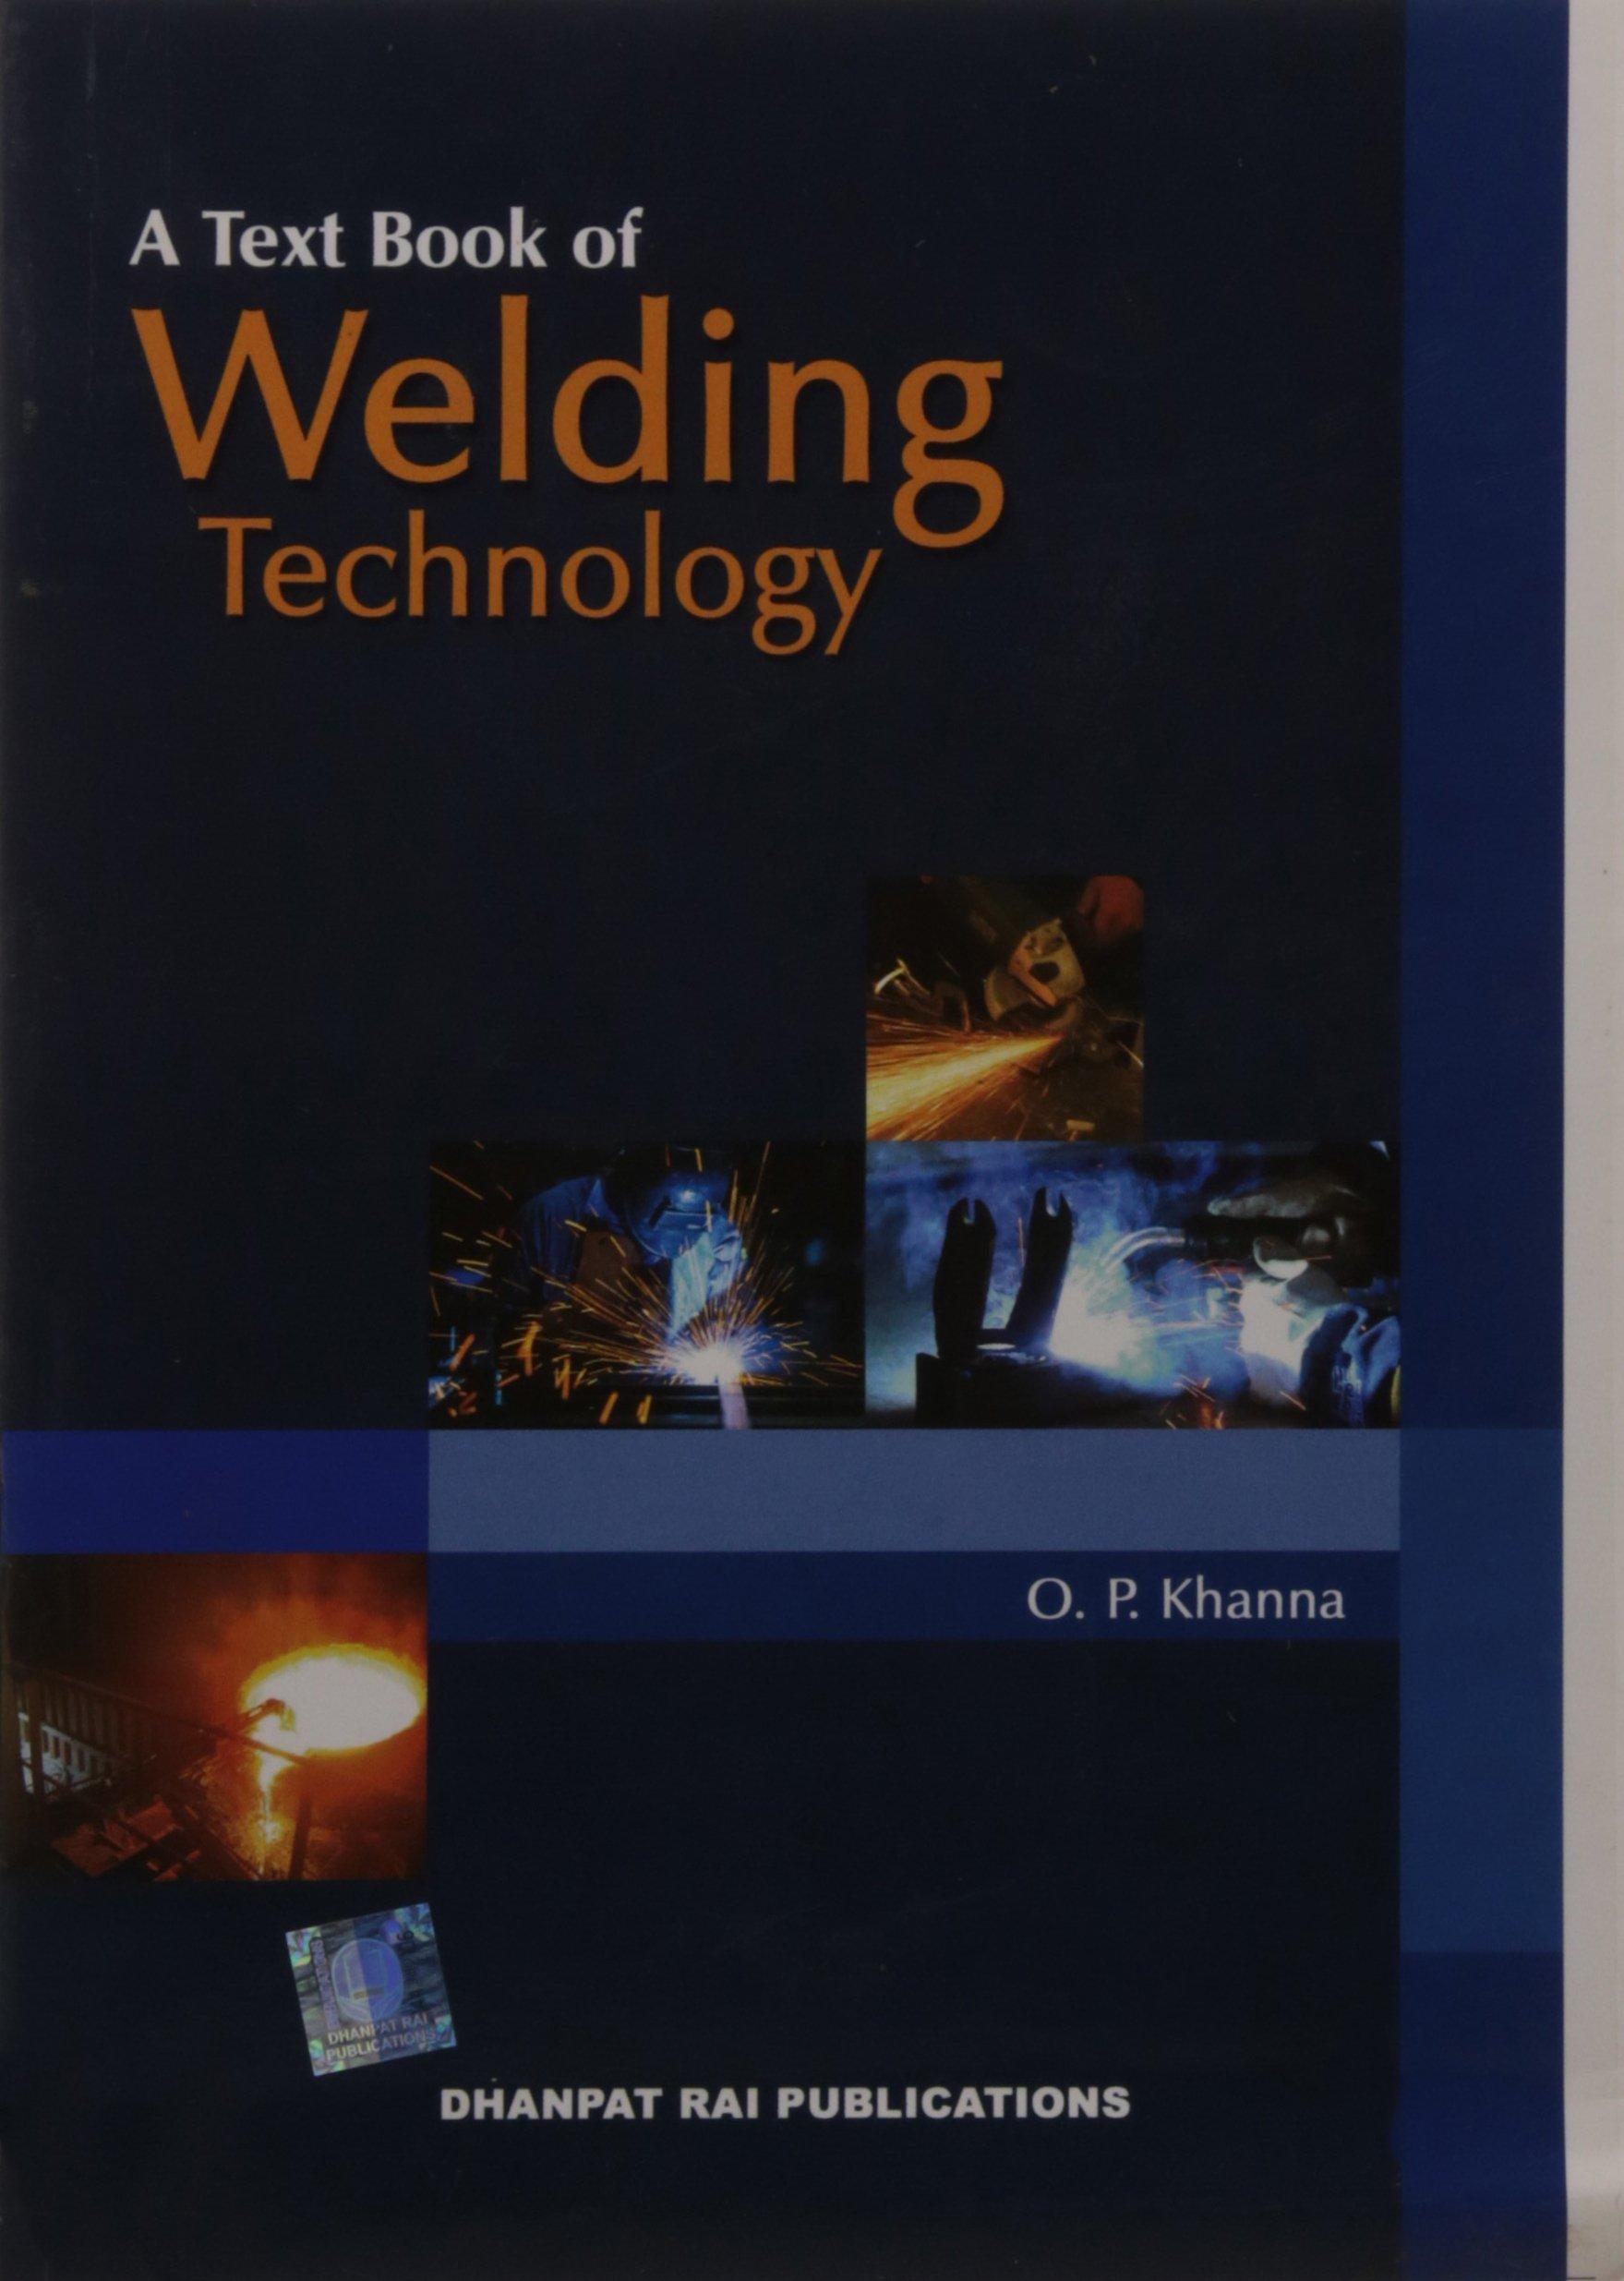 WELDING TECHNOLOGY BY OP KHANNA PDF DOWNLOAD